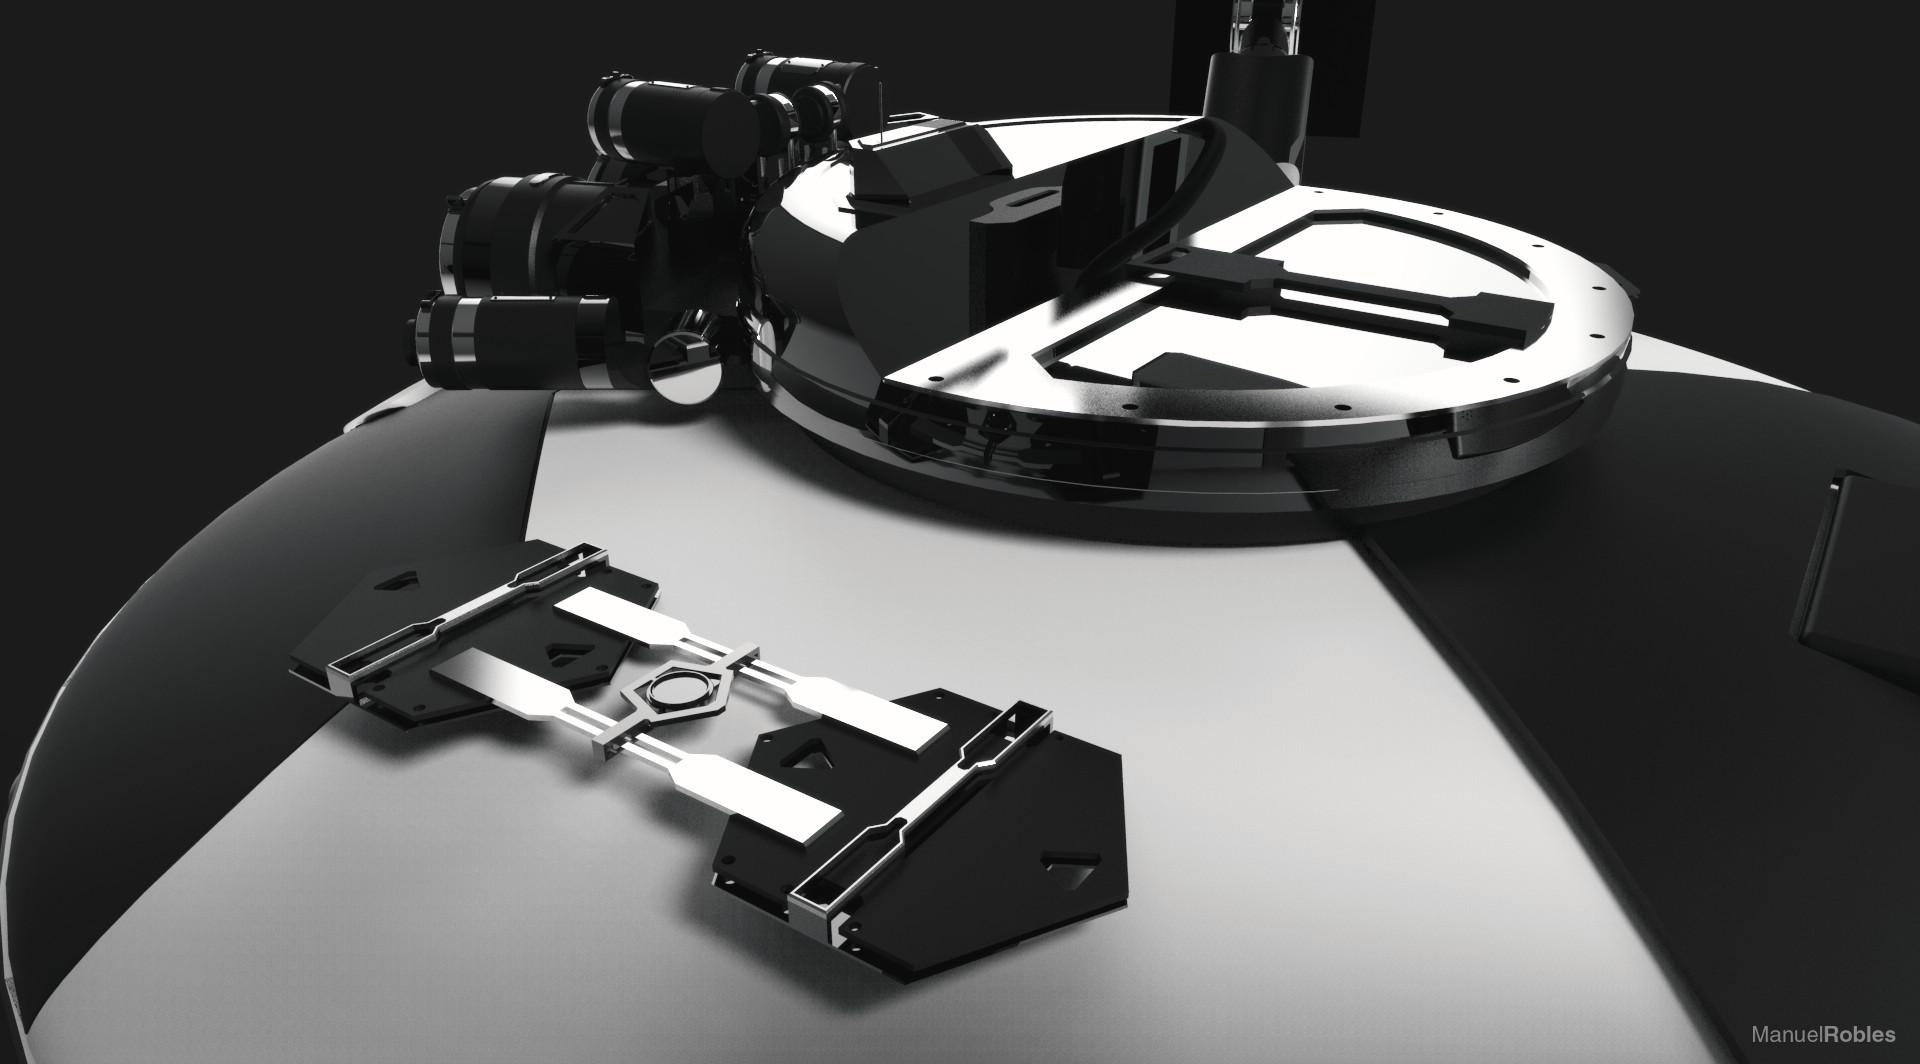 Manuel robles spider robotdron 02 viewset 29